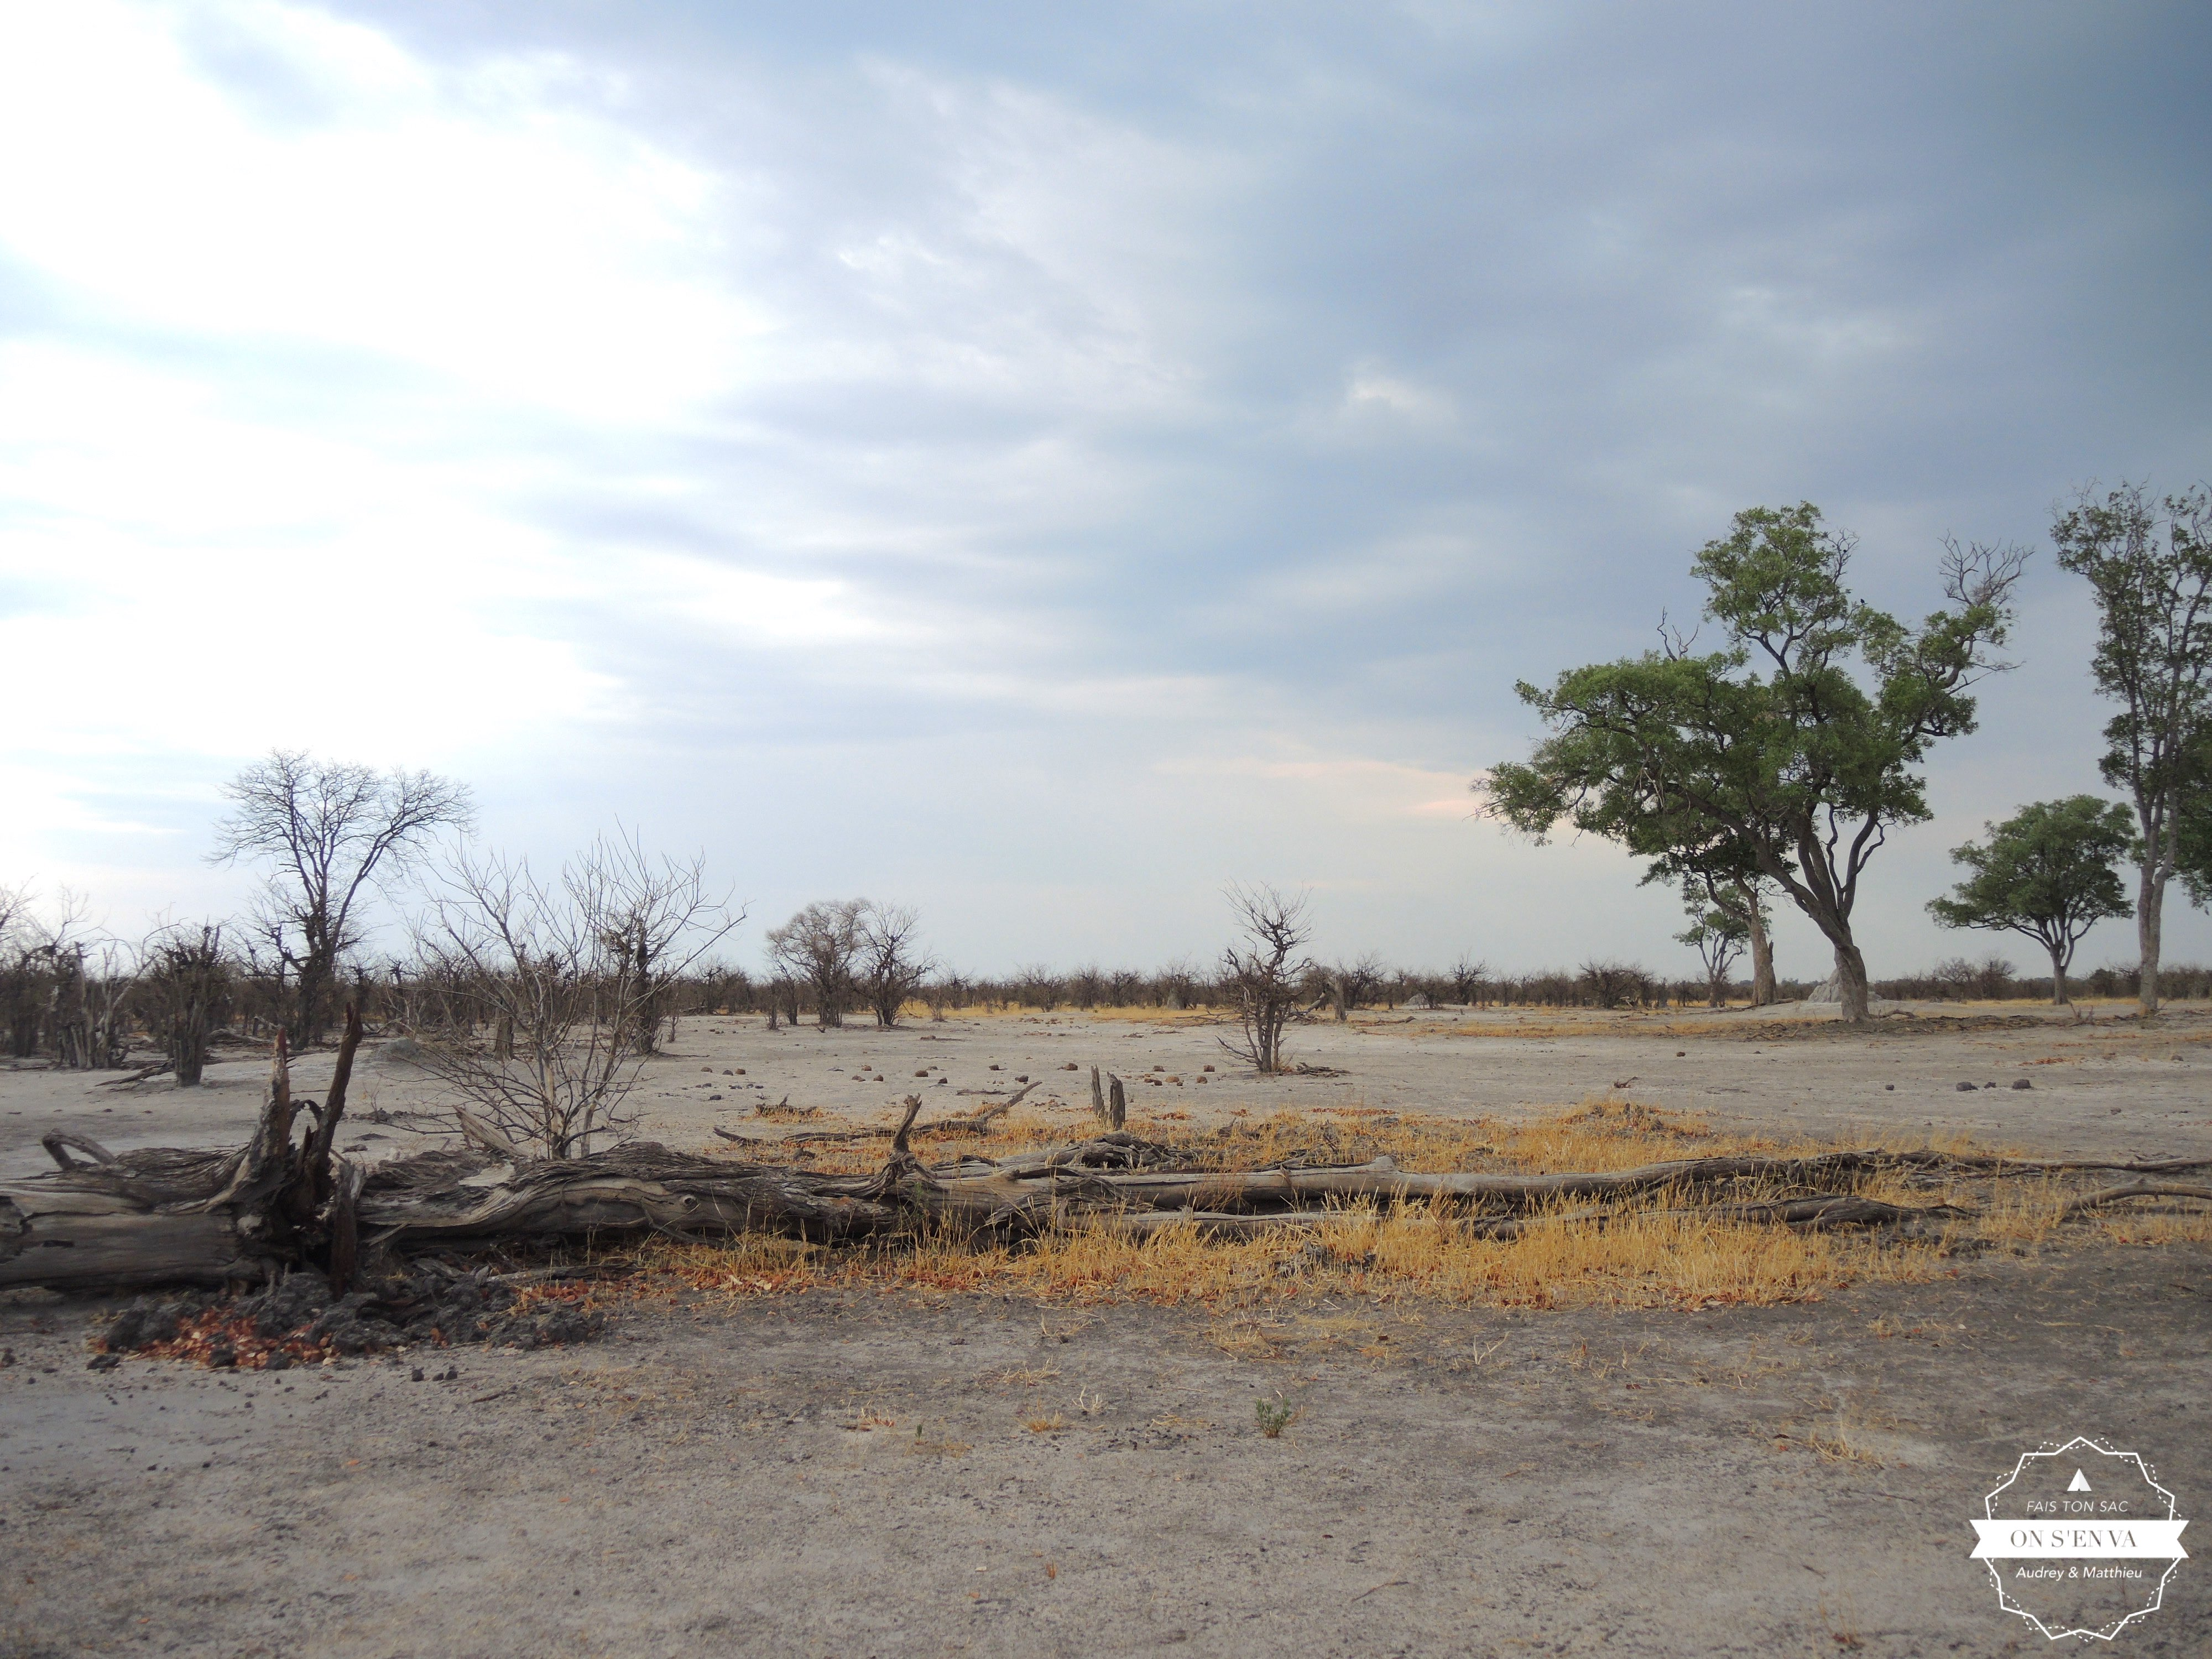 Arrivée à Moremi Game Reserve